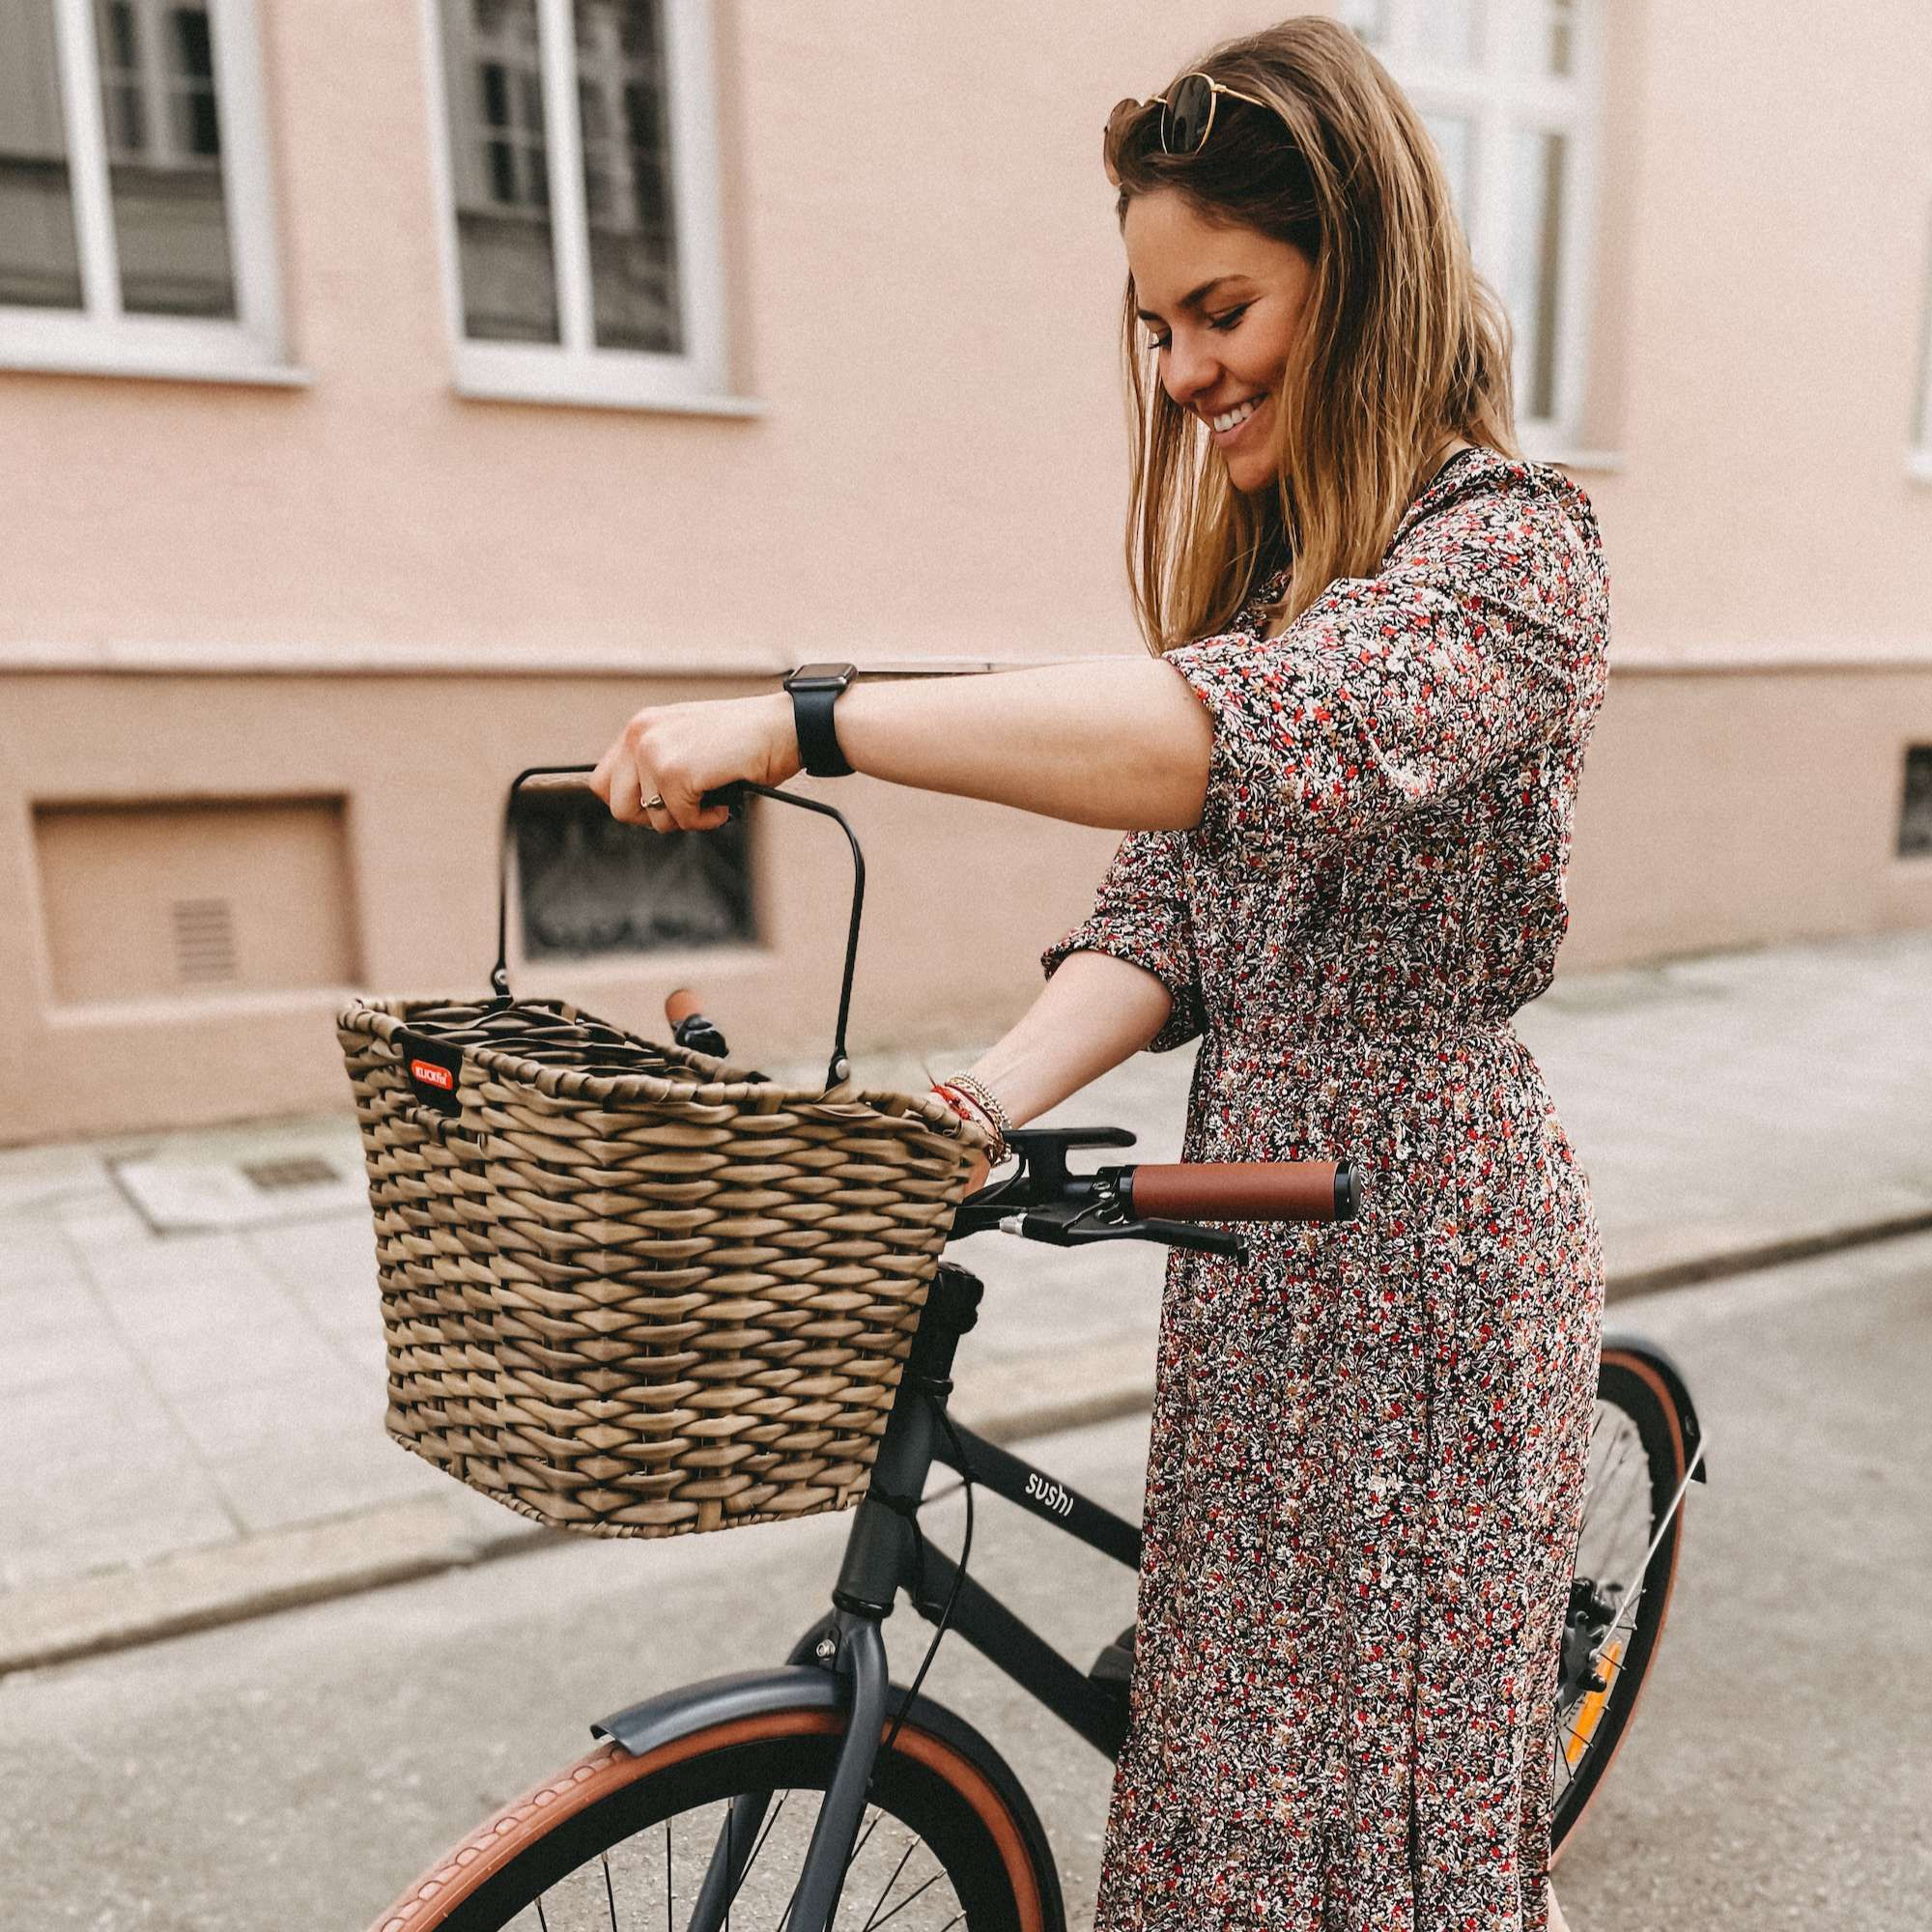 Fahrradkorb für E-Bike